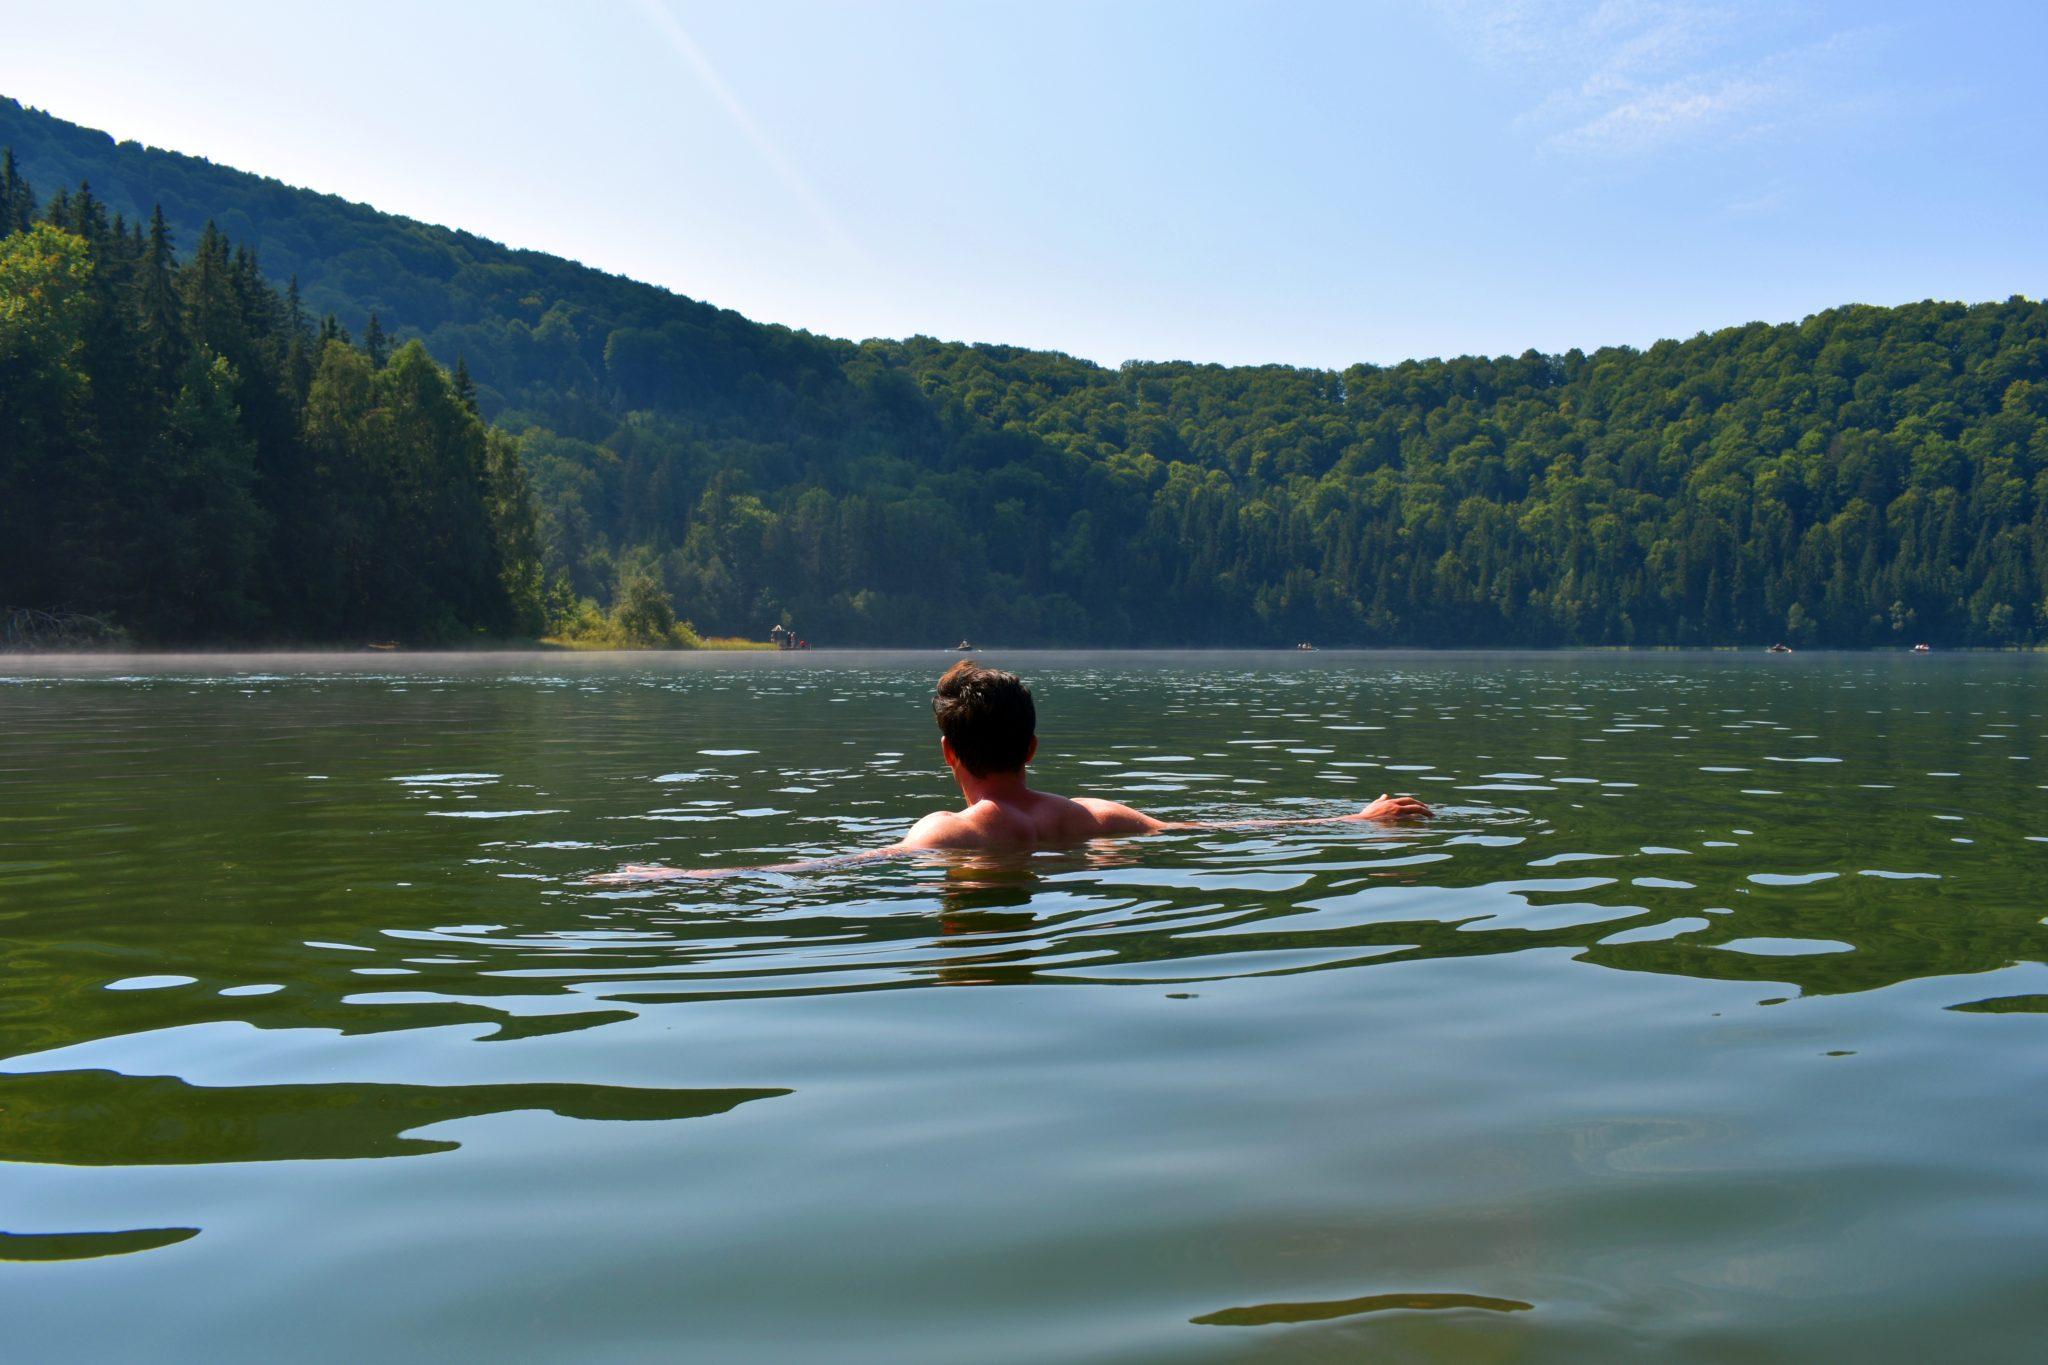 Lacul Sfanta Ana si Tinovul Mohos, locuri binecuvantate de natura